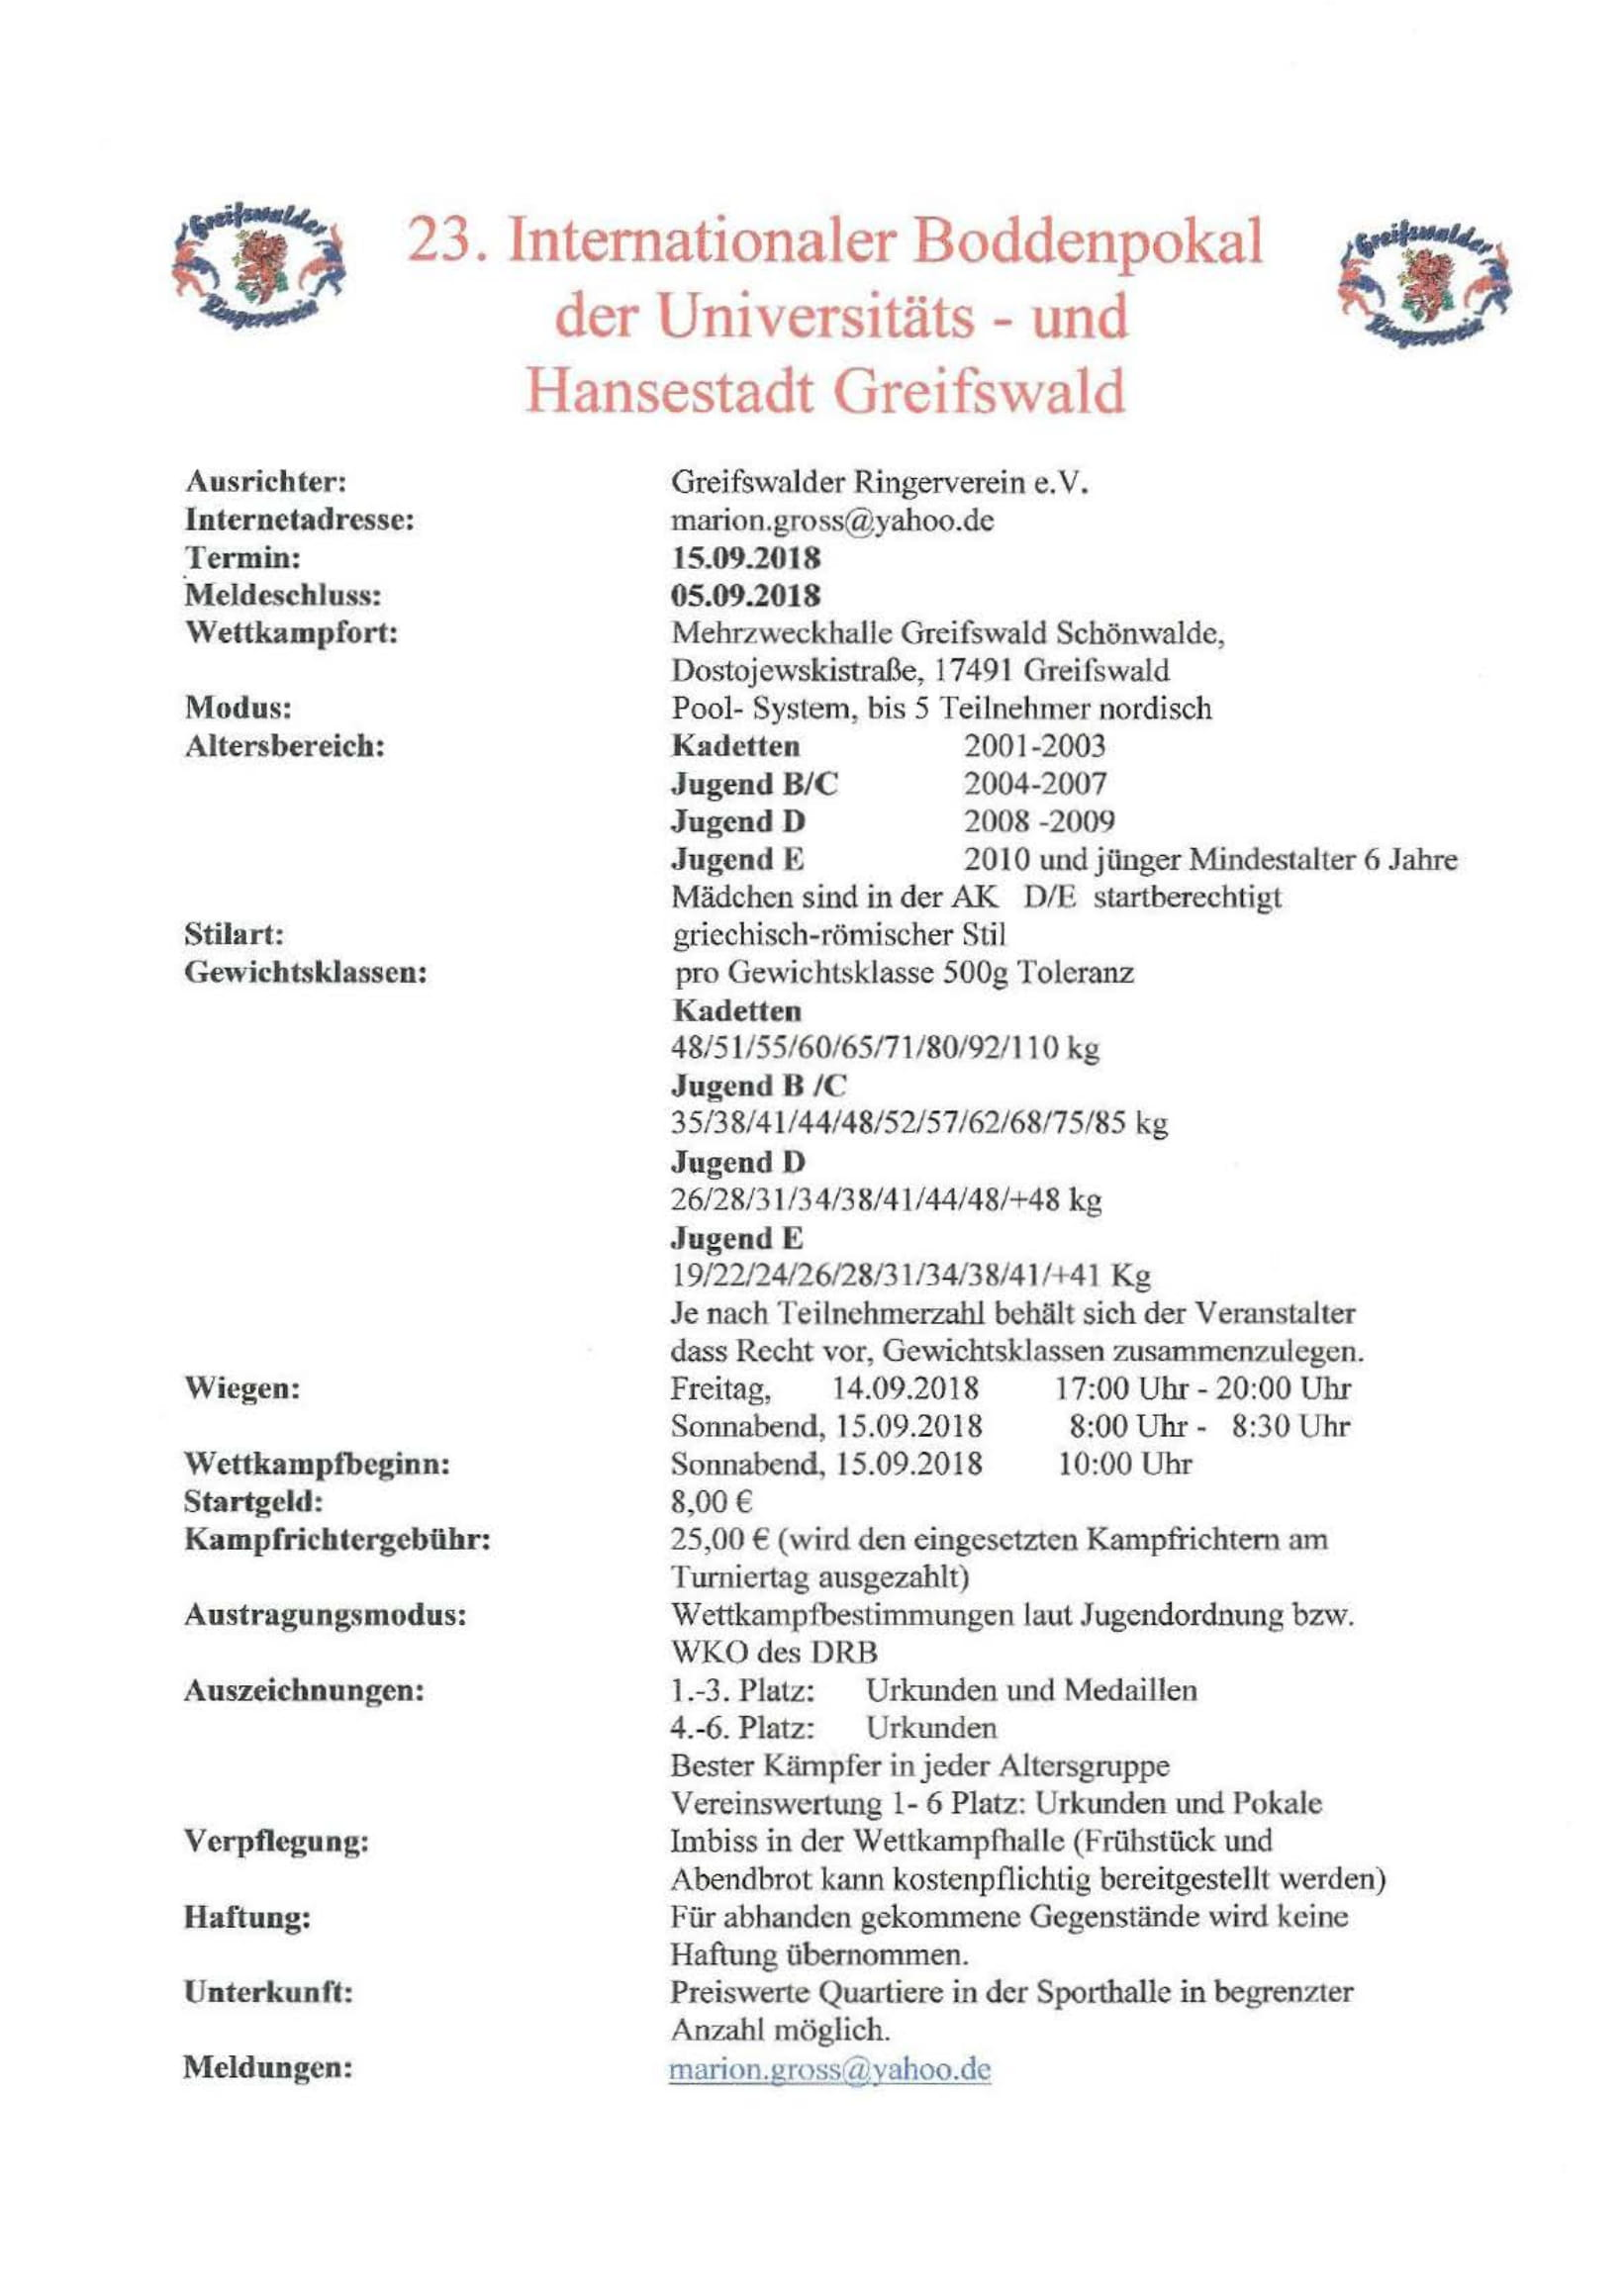 23. Internationaler Boddenpokal Greifswald